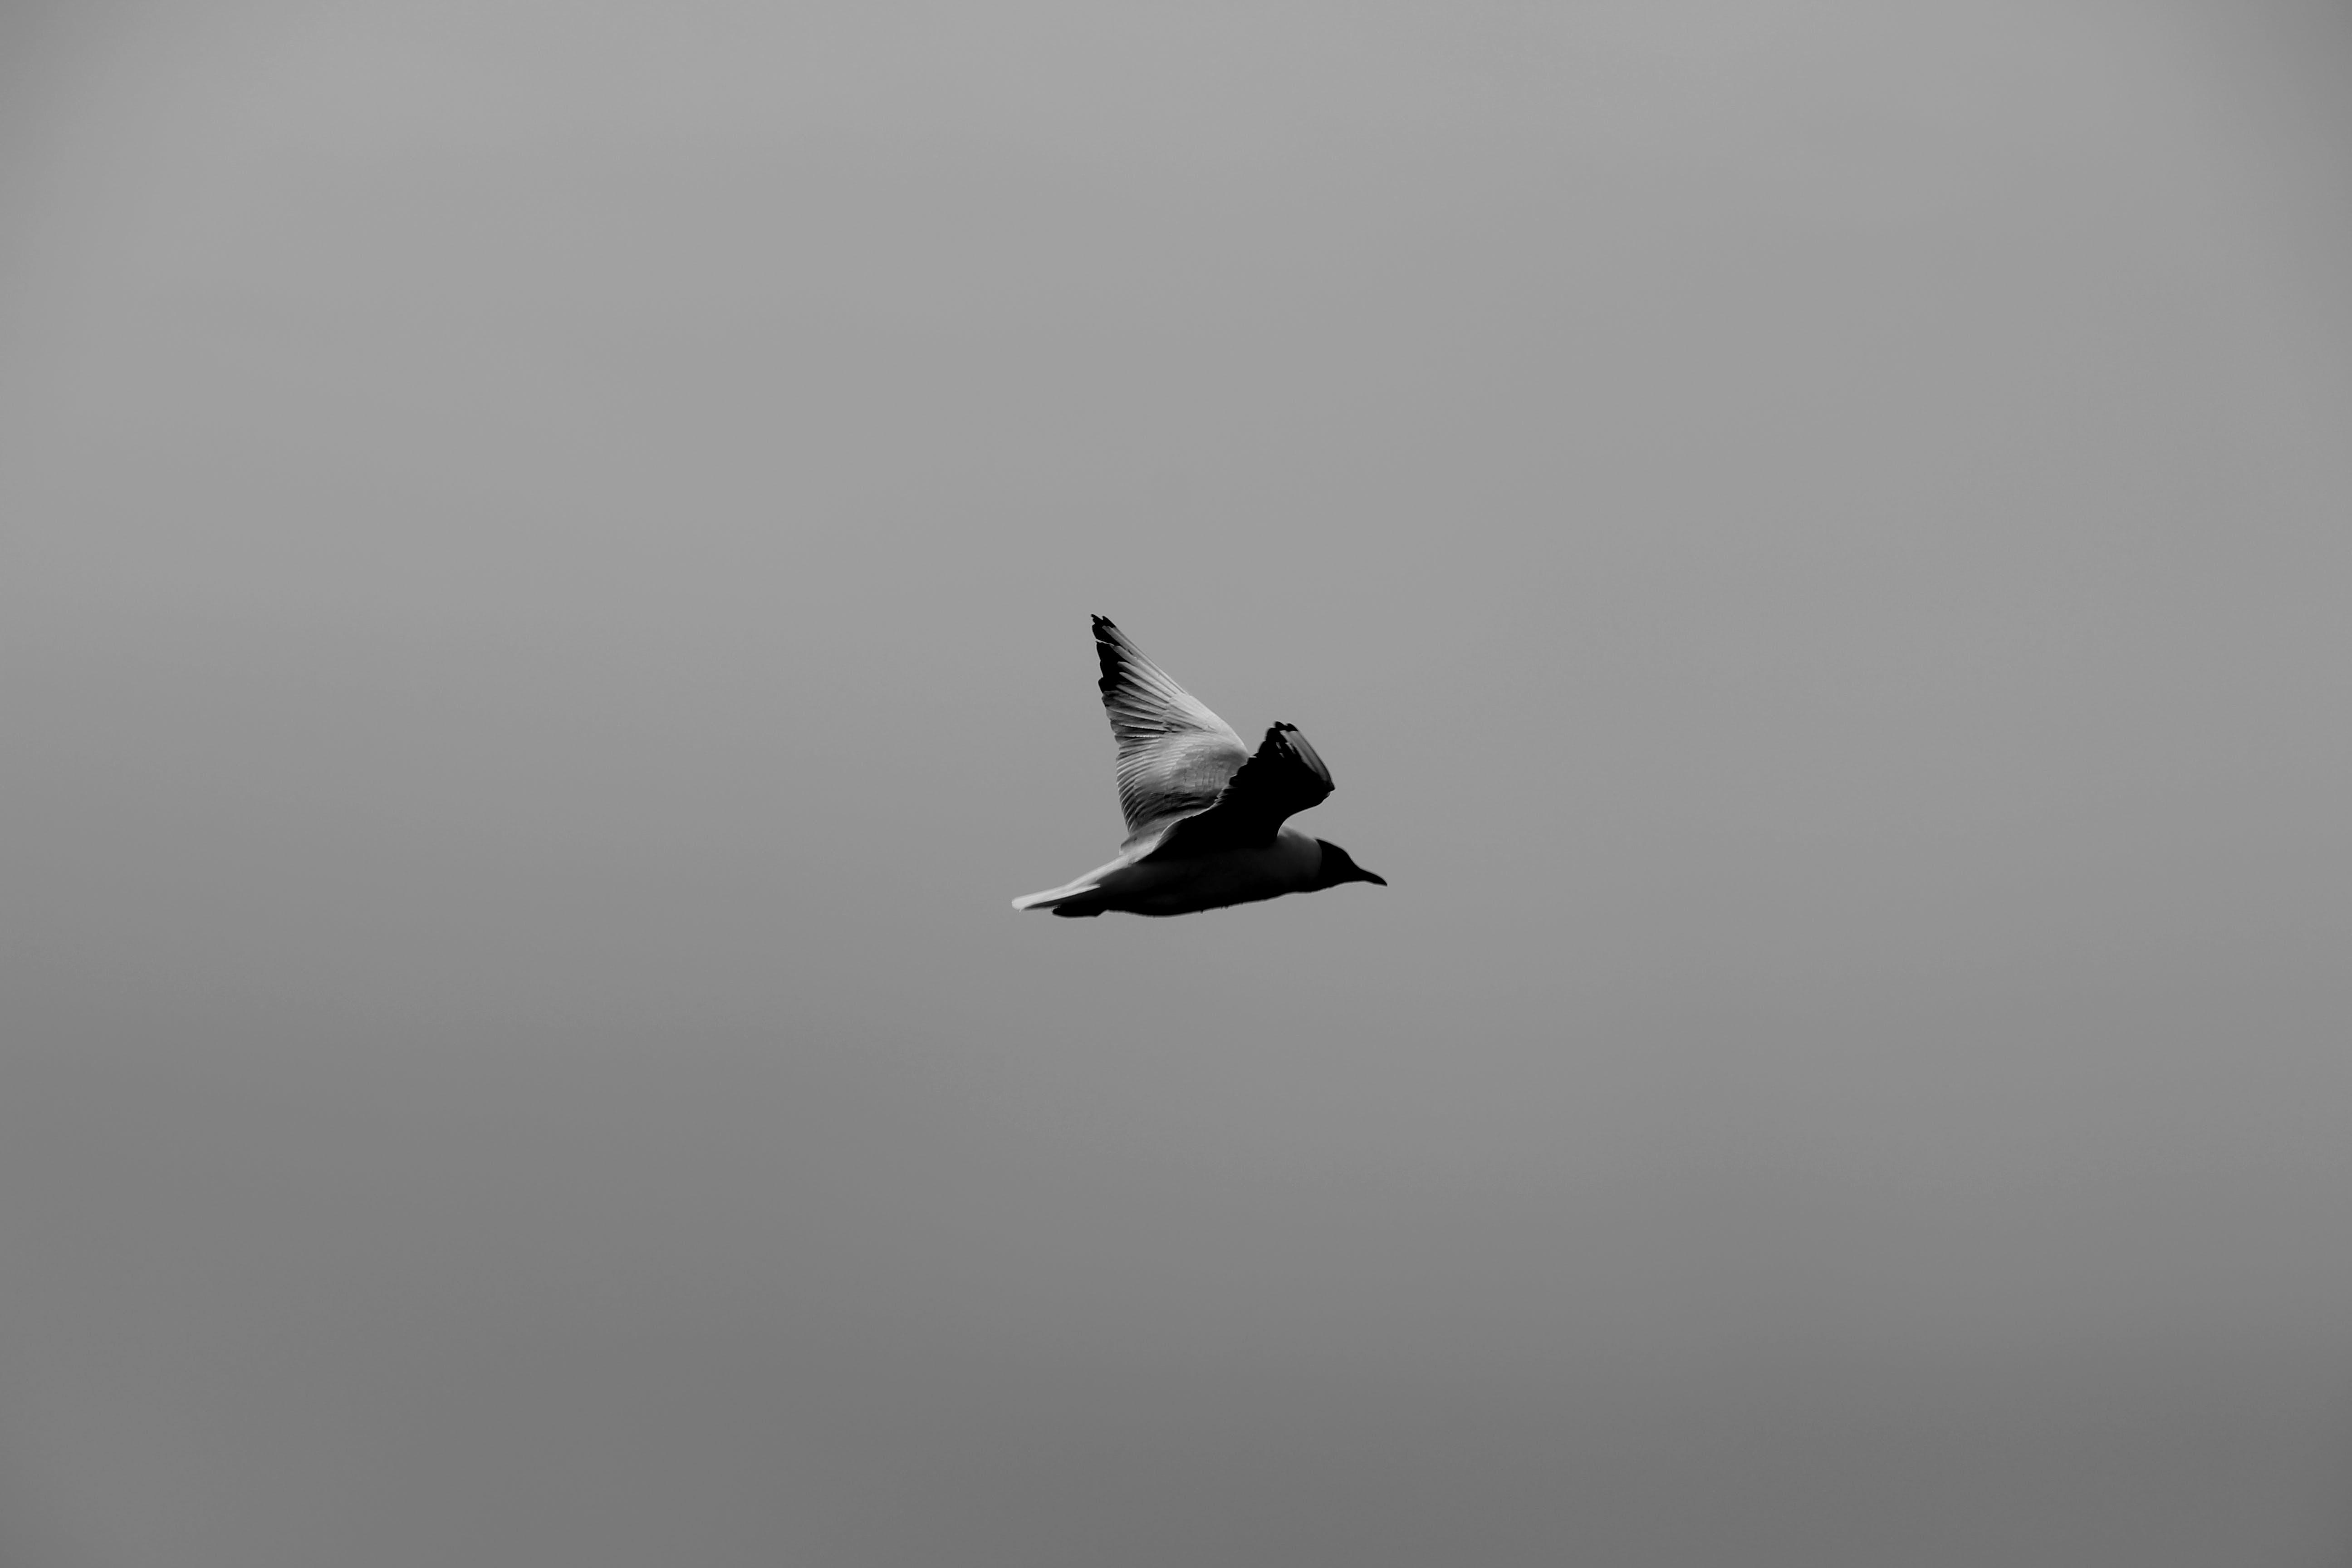 Gray and Black Bird